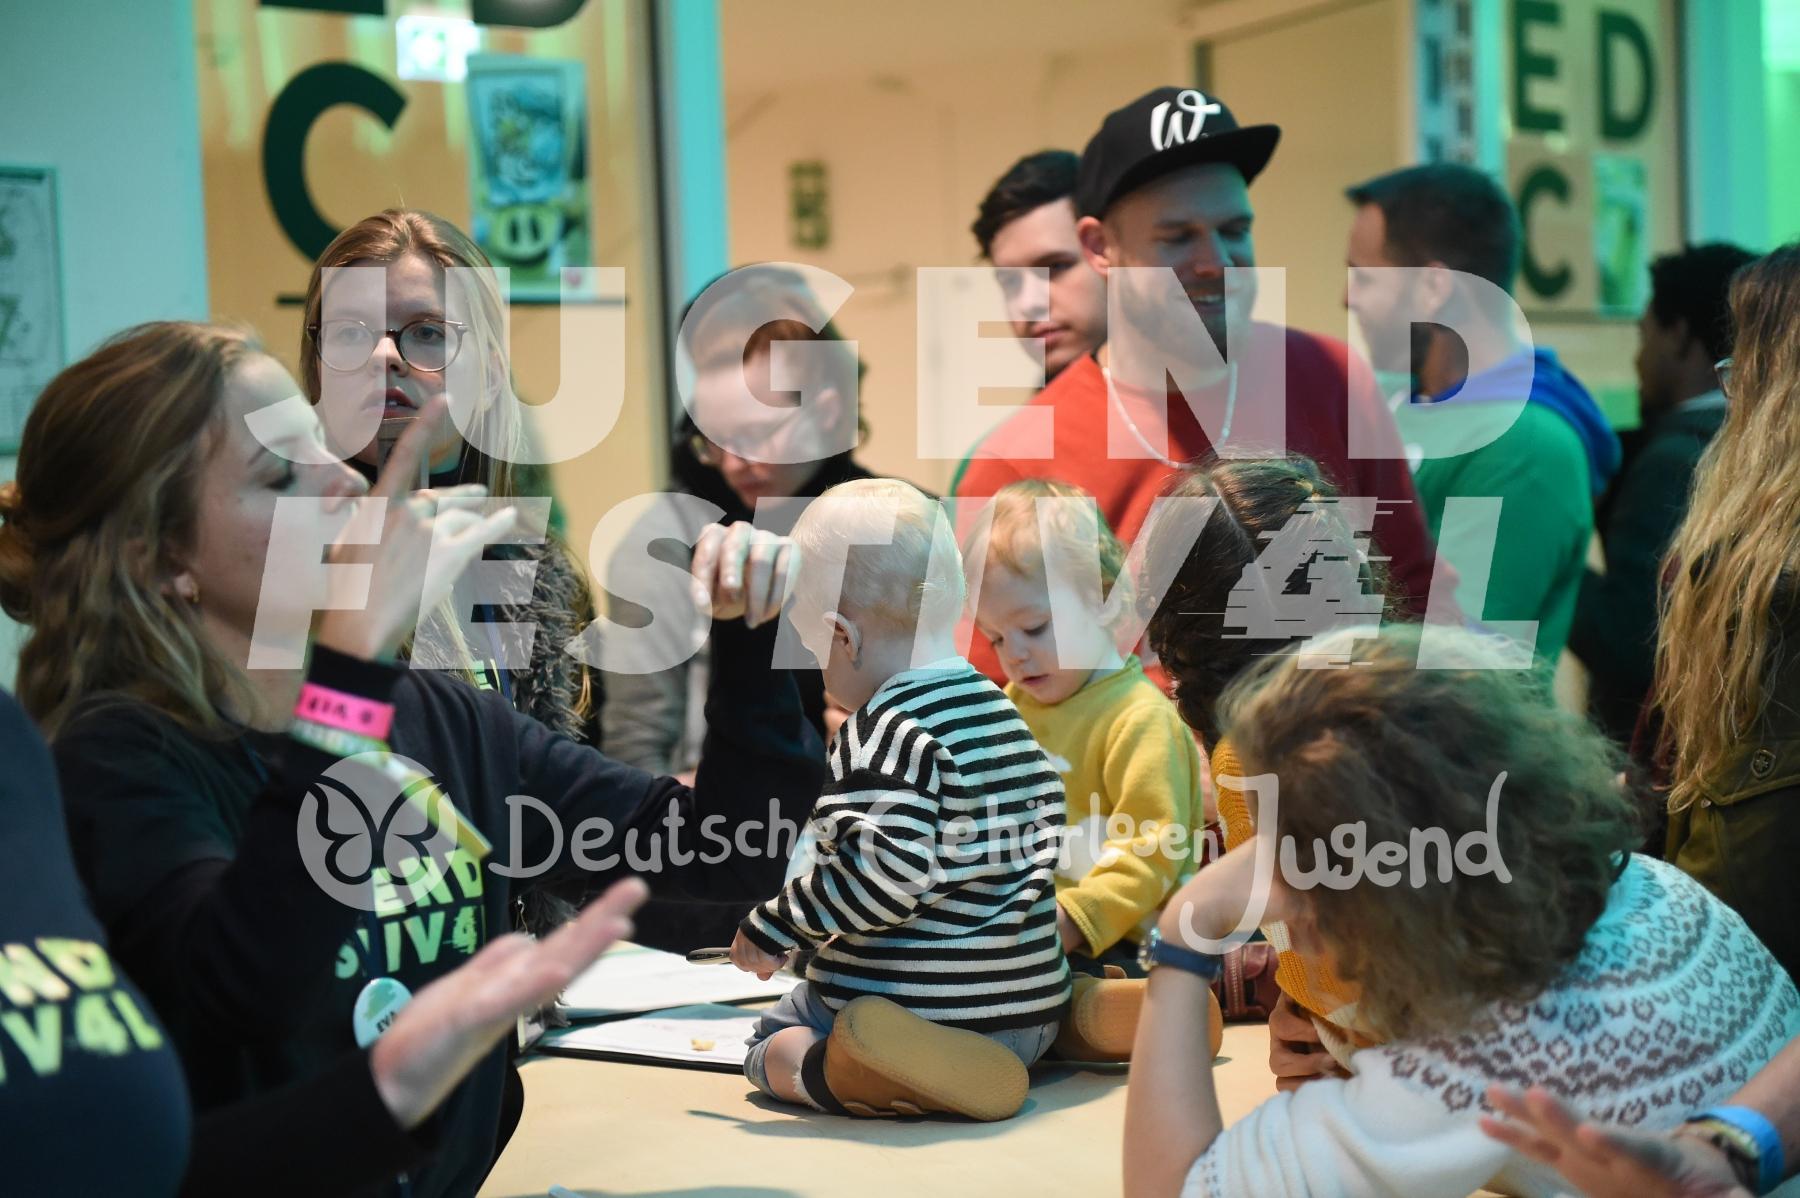 Jugendfestiv4l-125